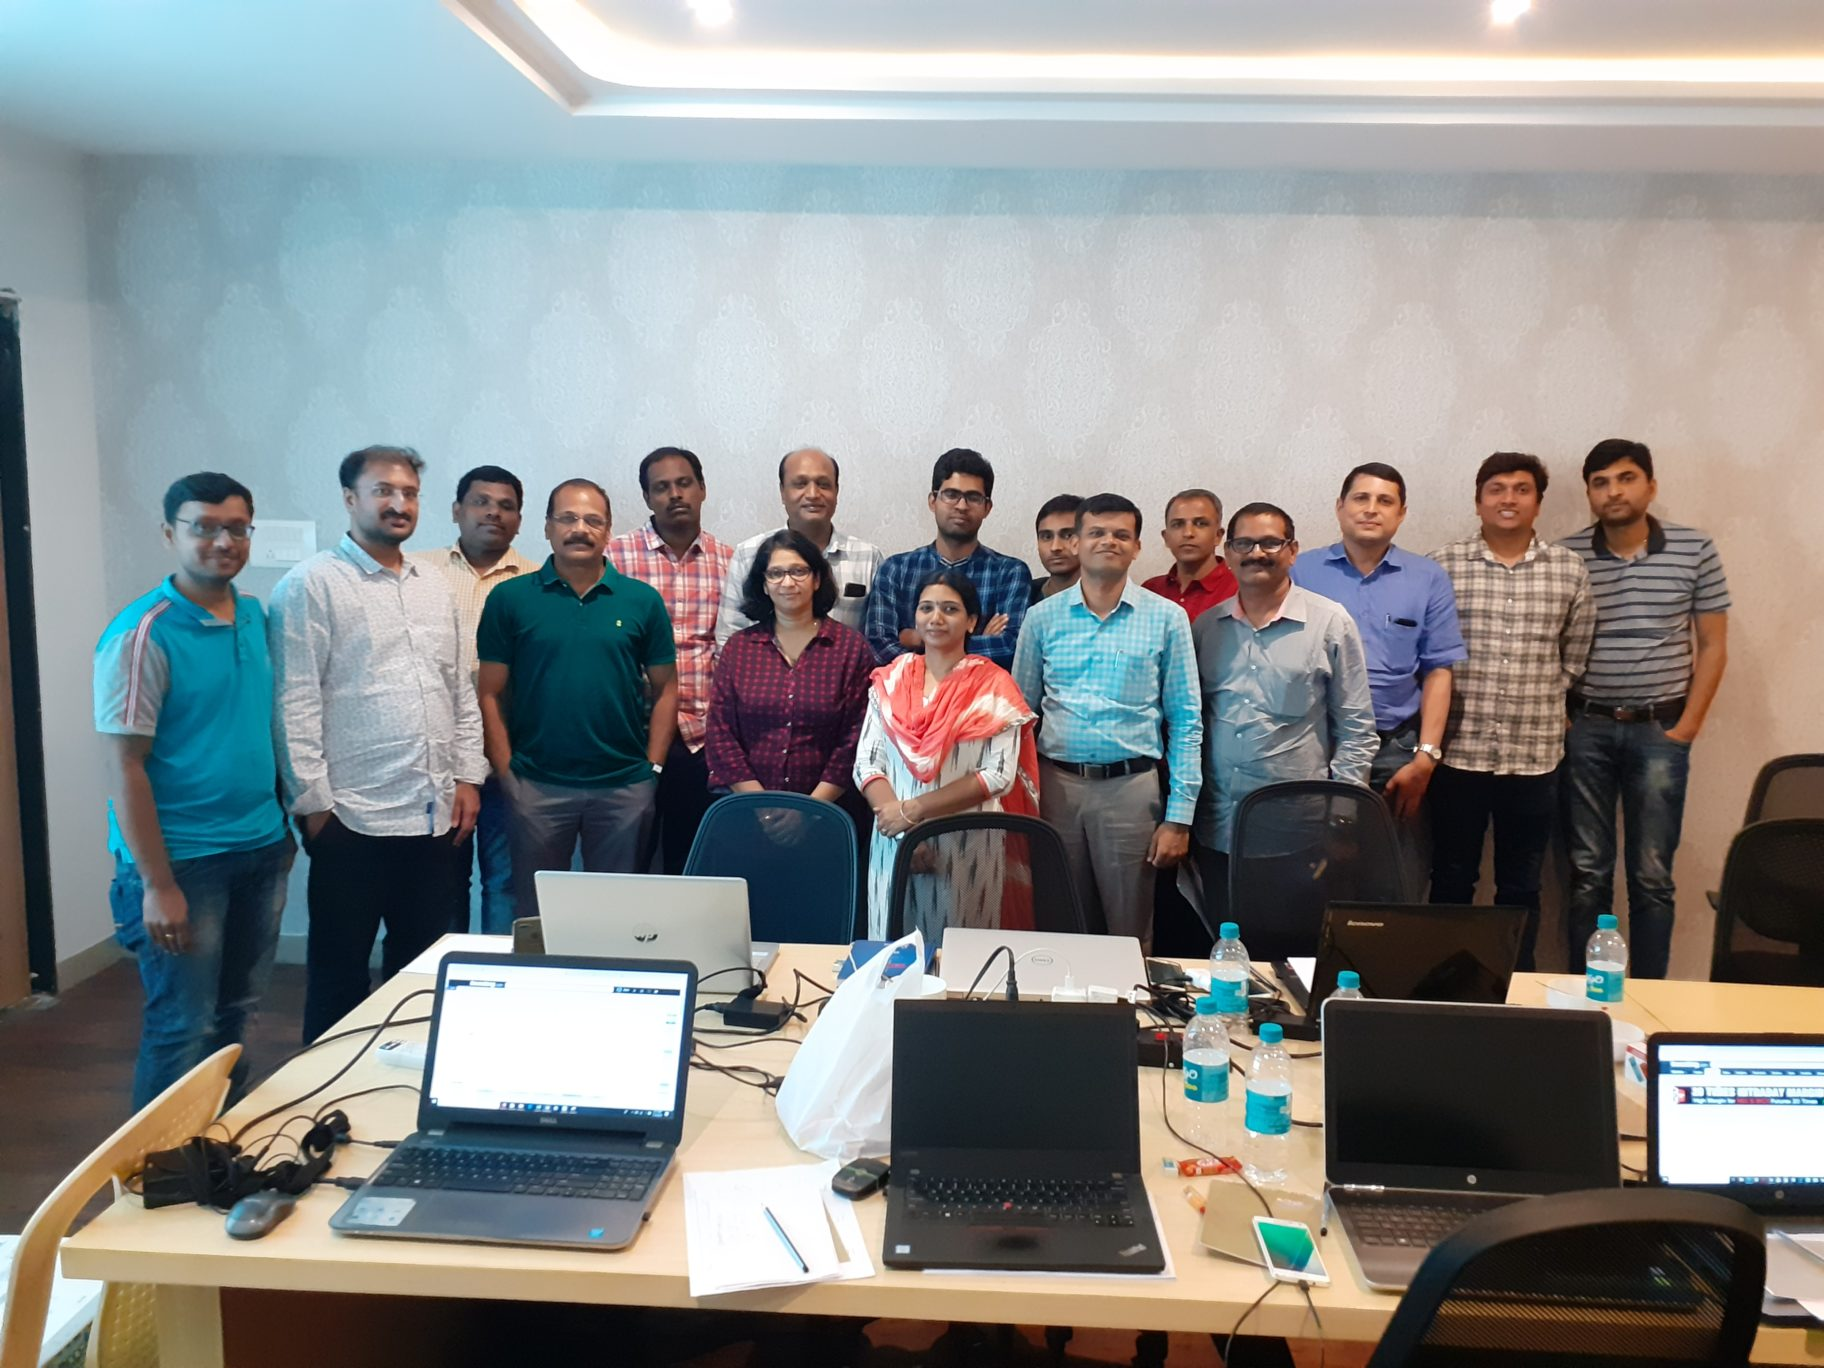 20190714 171750 1824x1368 - Hyderabad Seminar - July 14 ,2019